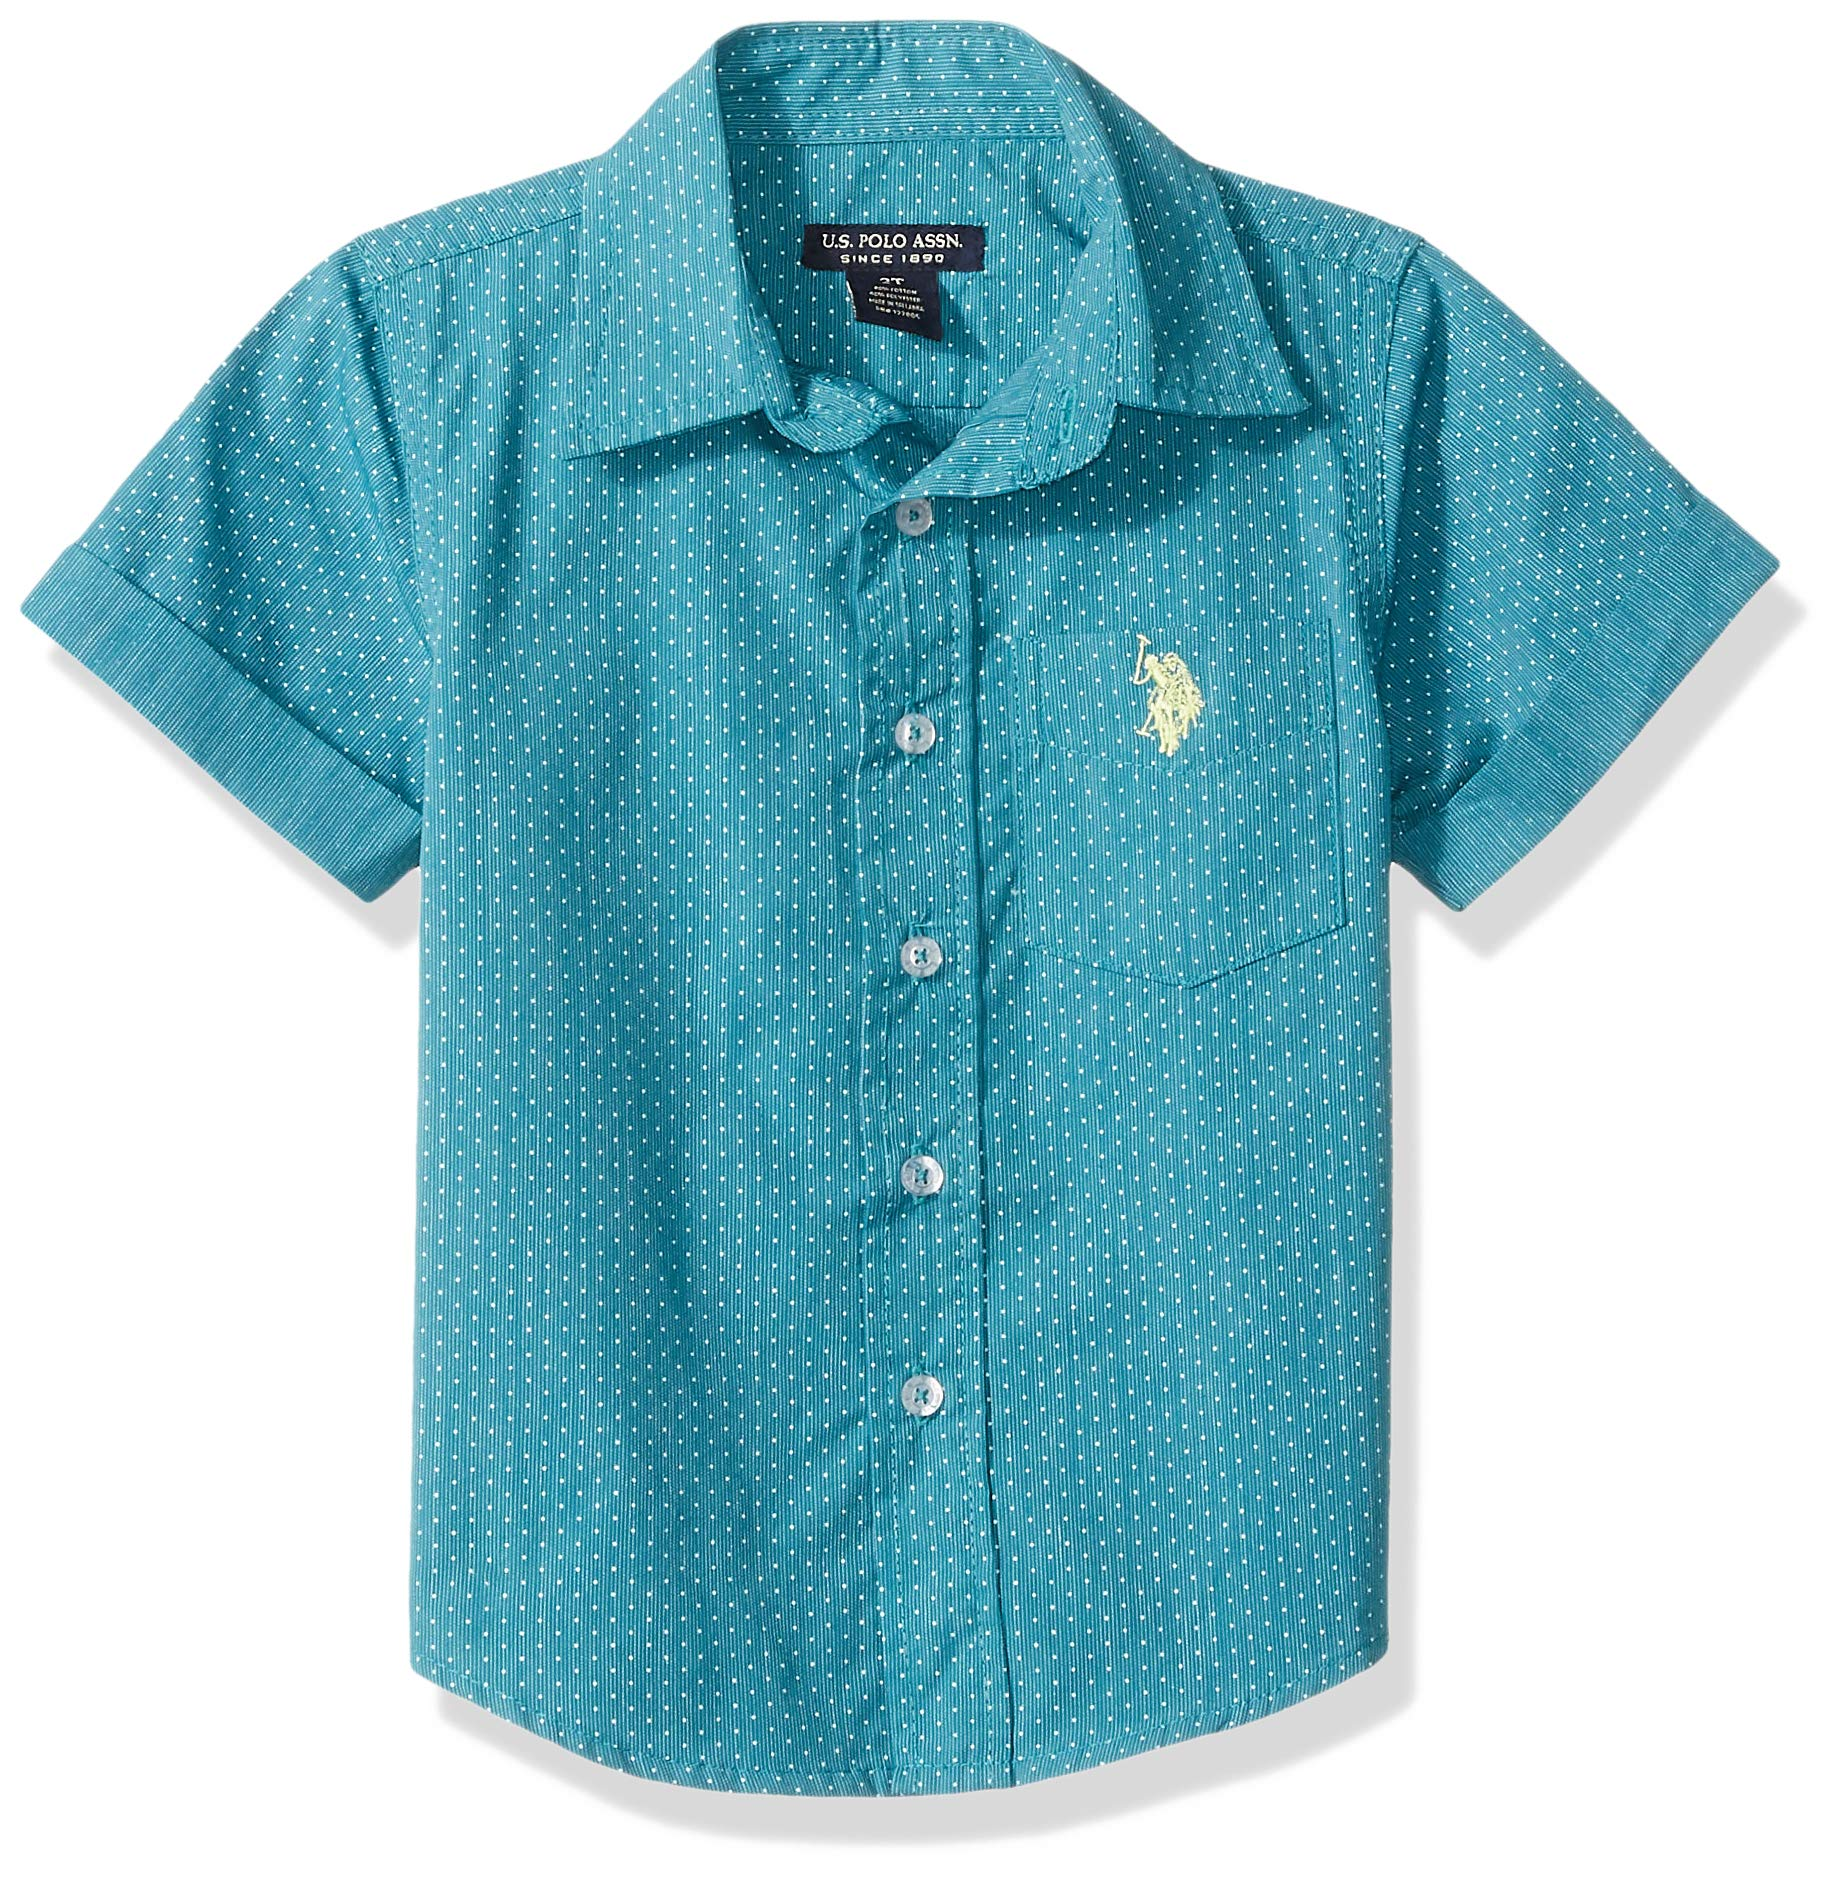 U.S. Polo Assn. Boys' Big Short Sleeve Striped Woven Shirt, Basel Teal, 10/12